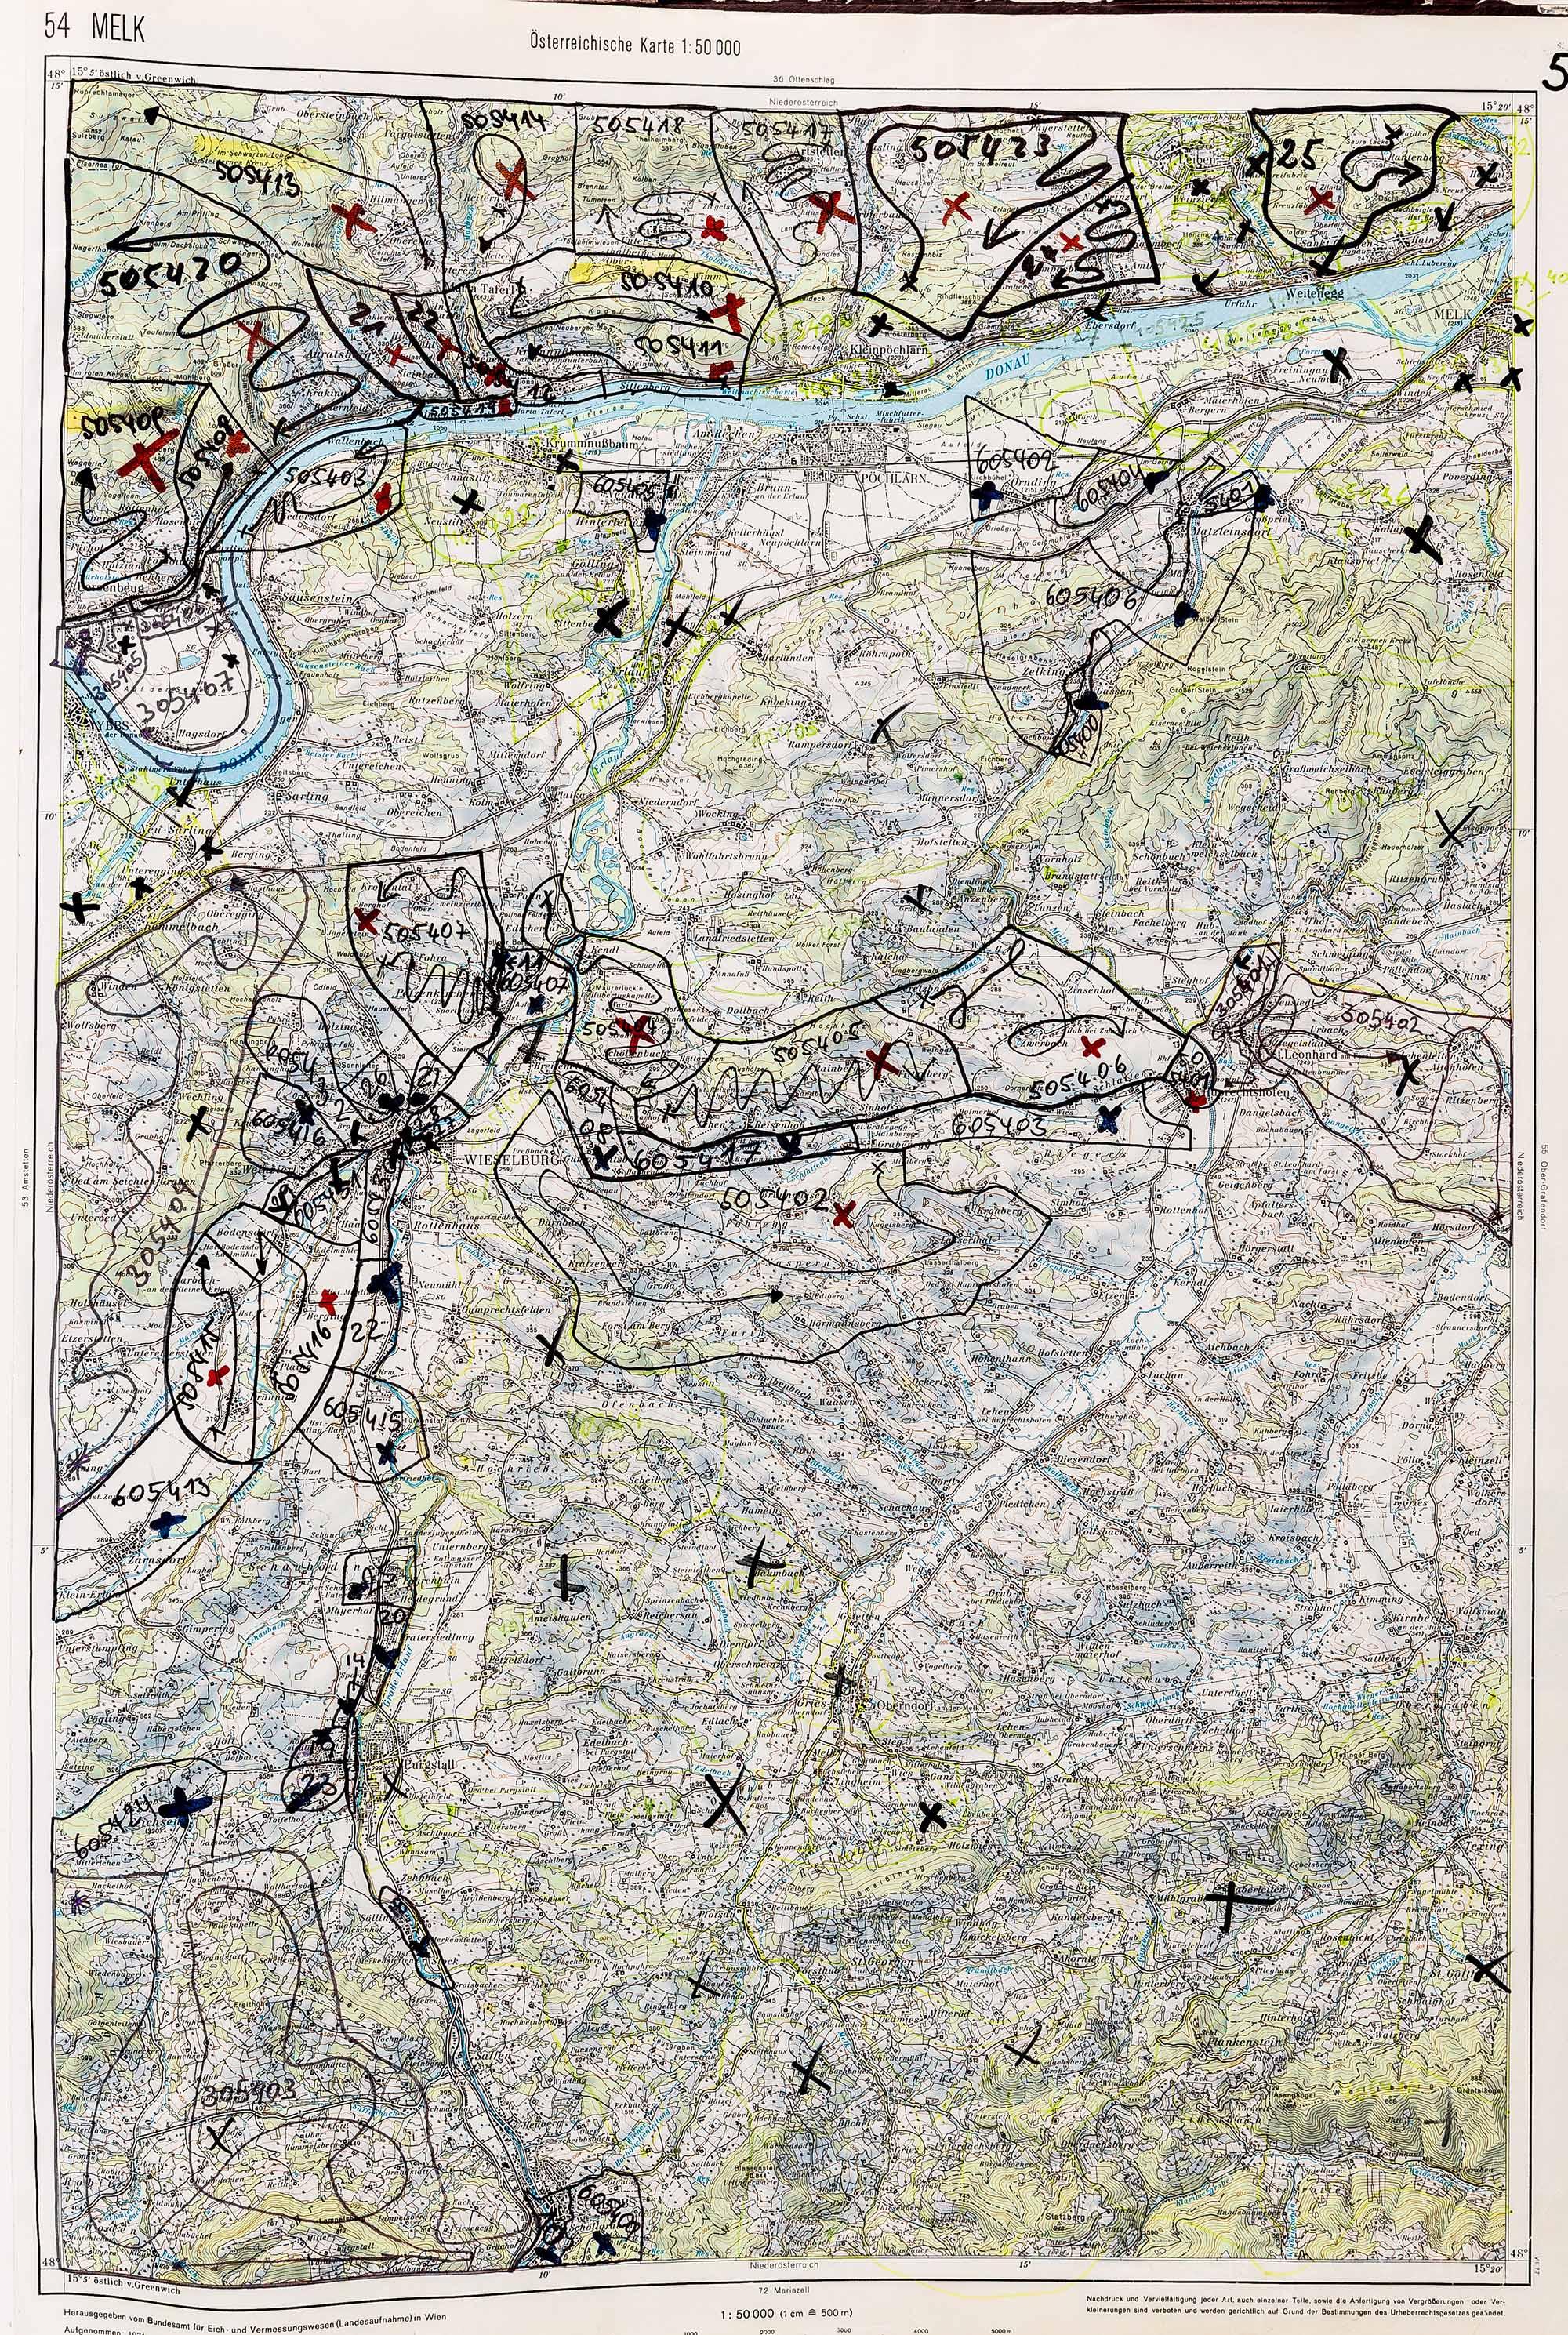 1983-1986 Karte 054